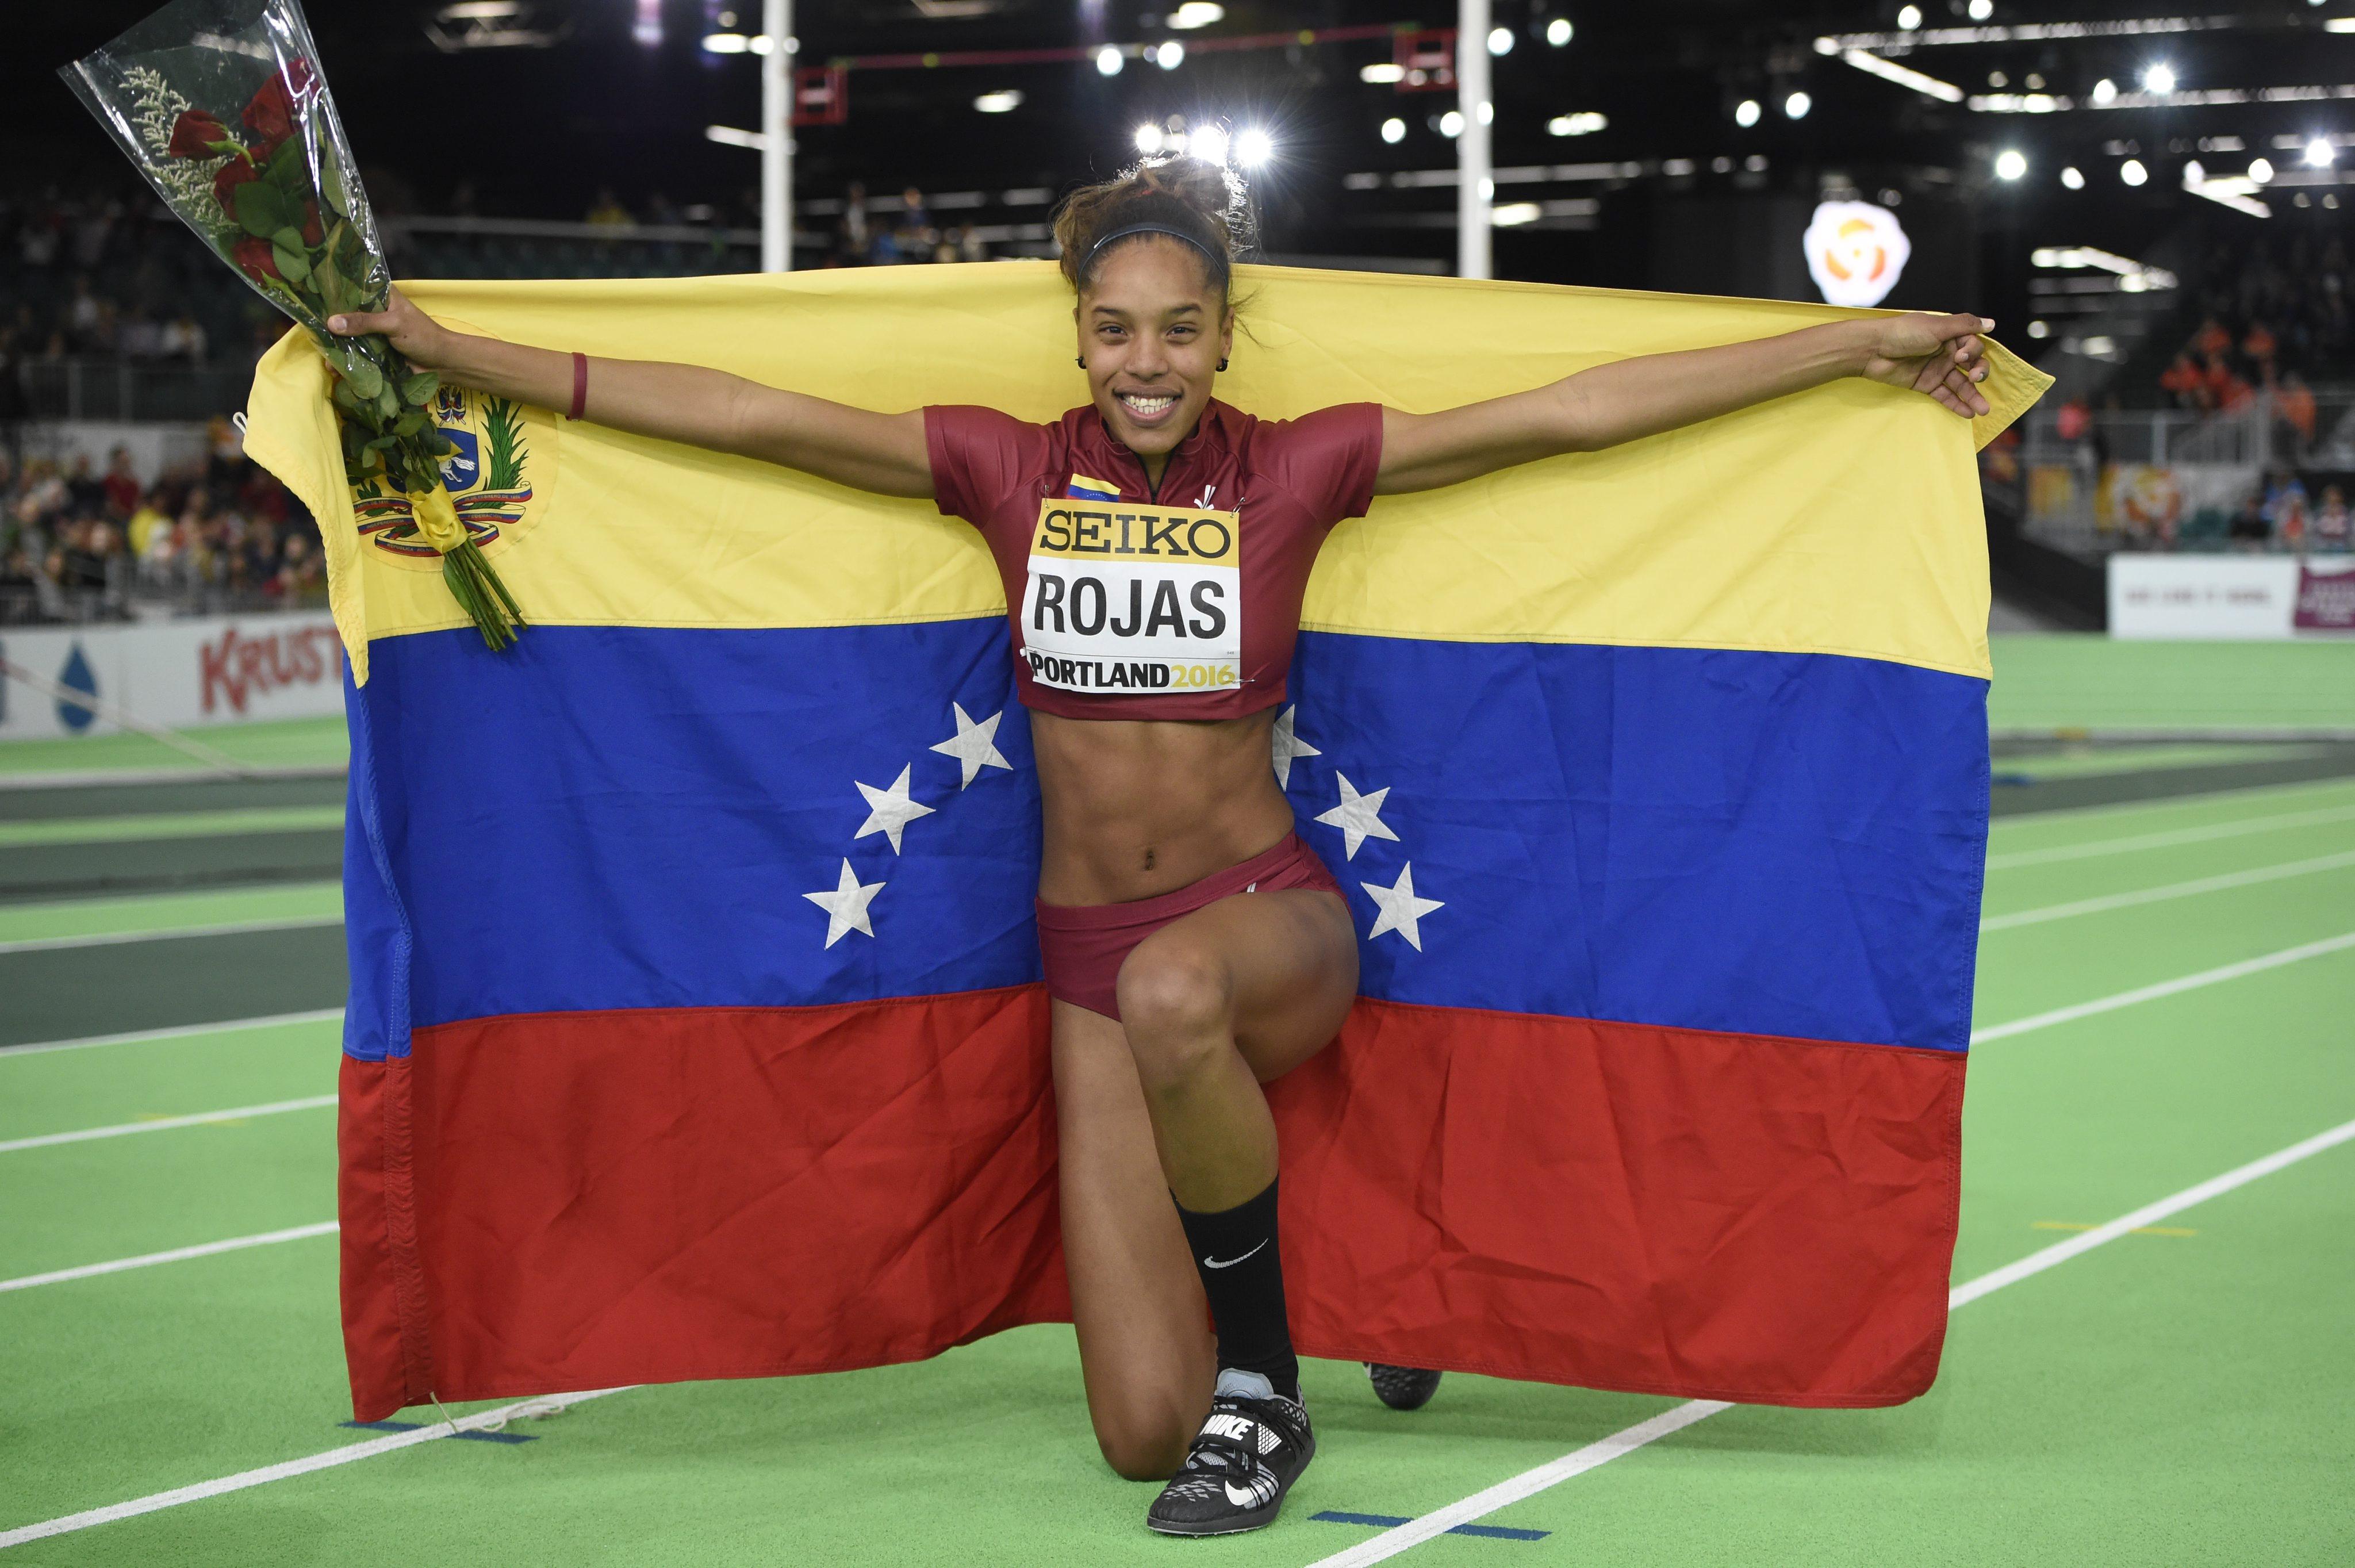 JGM31. Portland (United States), 19/03/2016.- Yulimar Rojas of Venezuela celebrates after her women's Triple Jump final at the IAAF World Indoor Championships in Portland, Oregon, USA, 19 March 2016. (Estados Unidos) EFE/EPA/JOHN G. MABANGLO